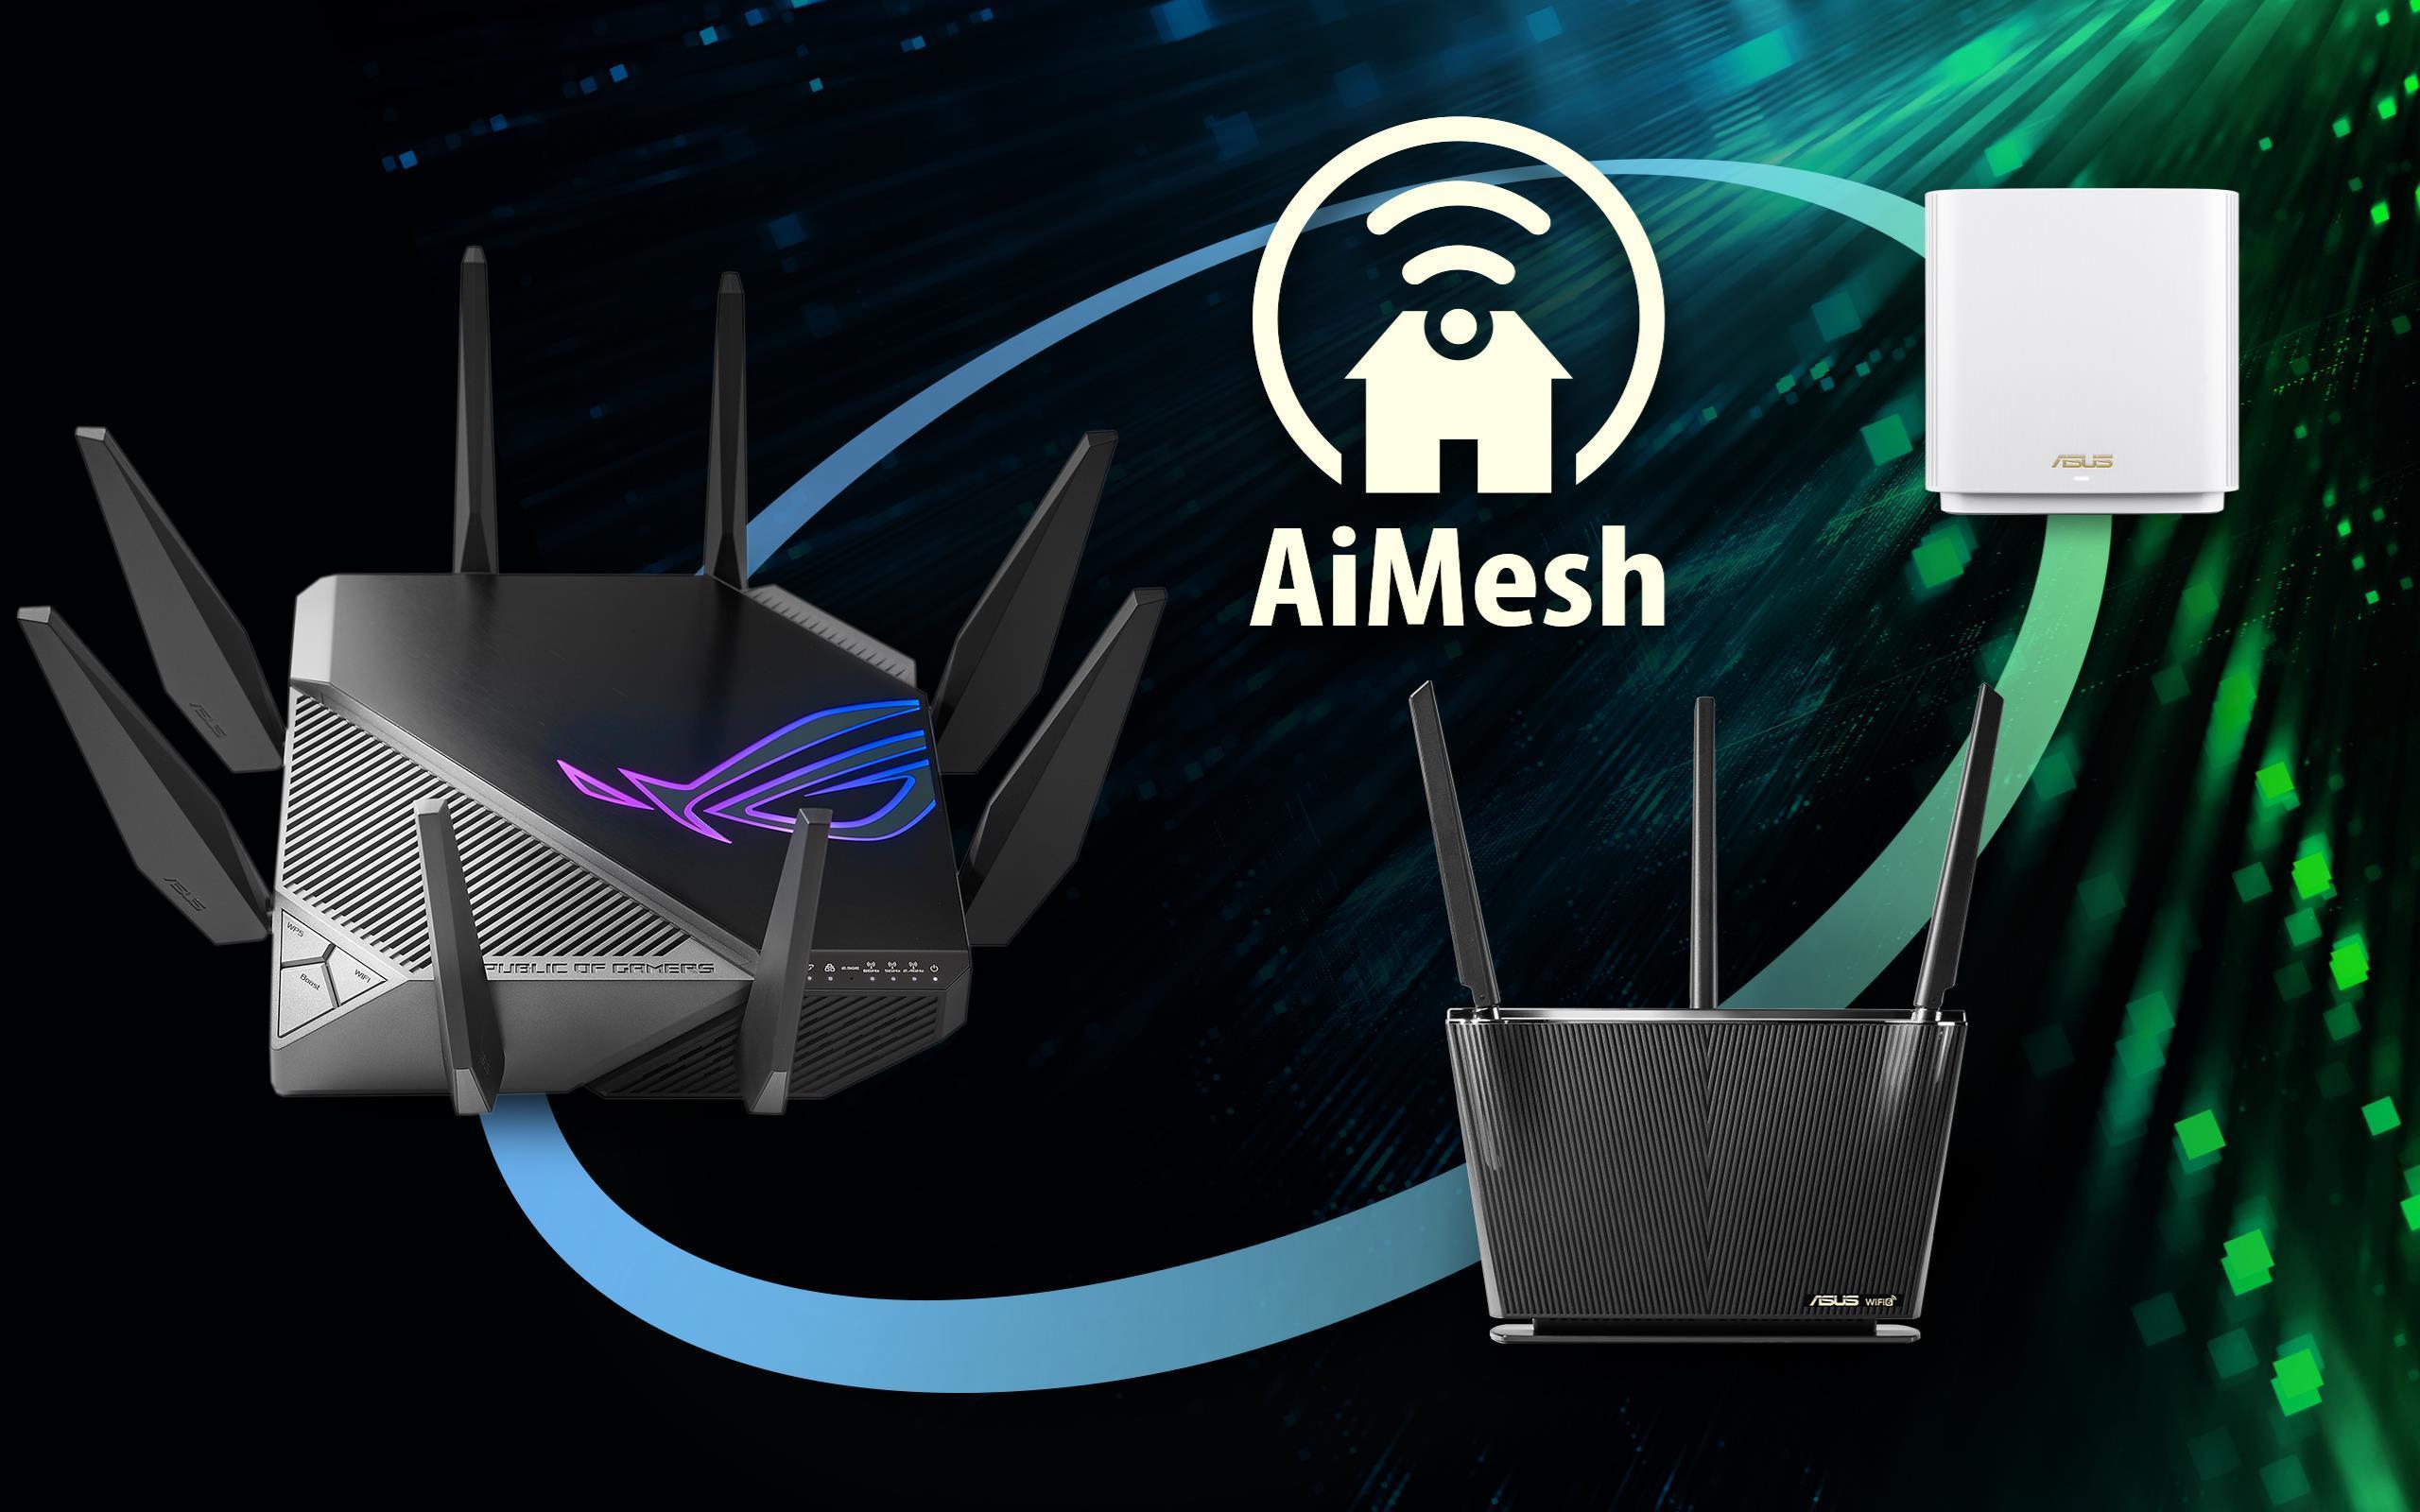 ASUS AiMesh WiFi System